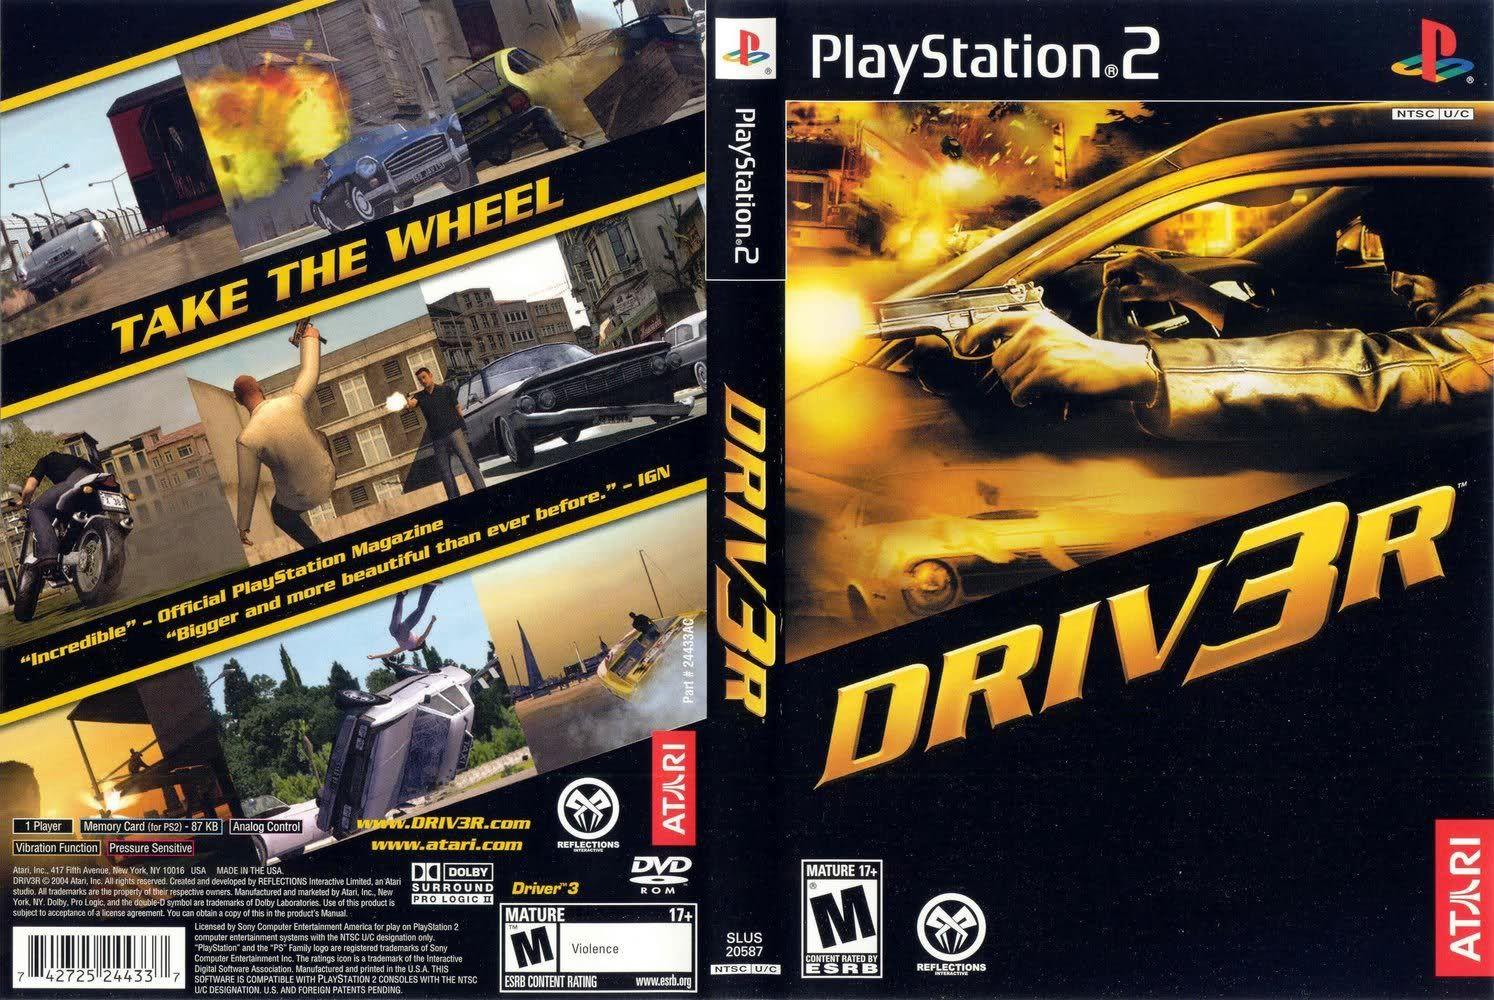 Driver 3 Playstation 2 Driv3r Playstation Videojuegos